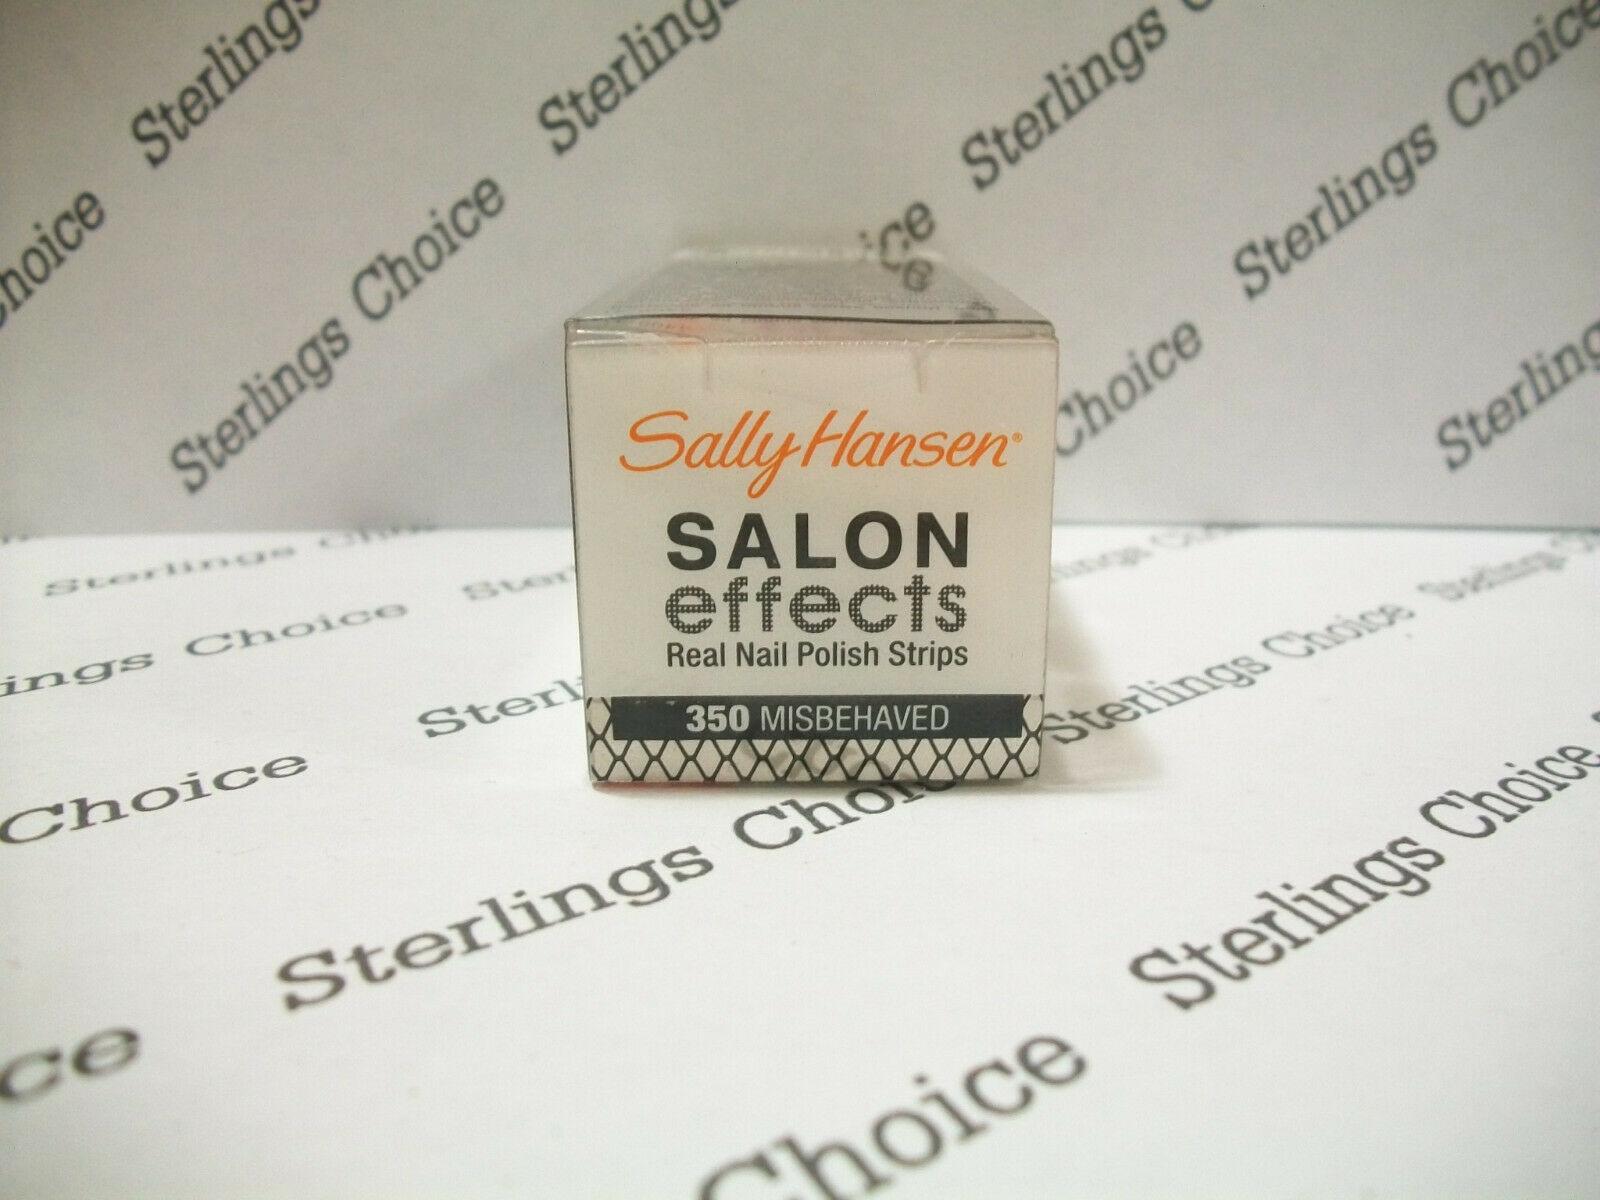 Sally Hansen Salon Effects Nail Polish Strips #350 Misbehaved